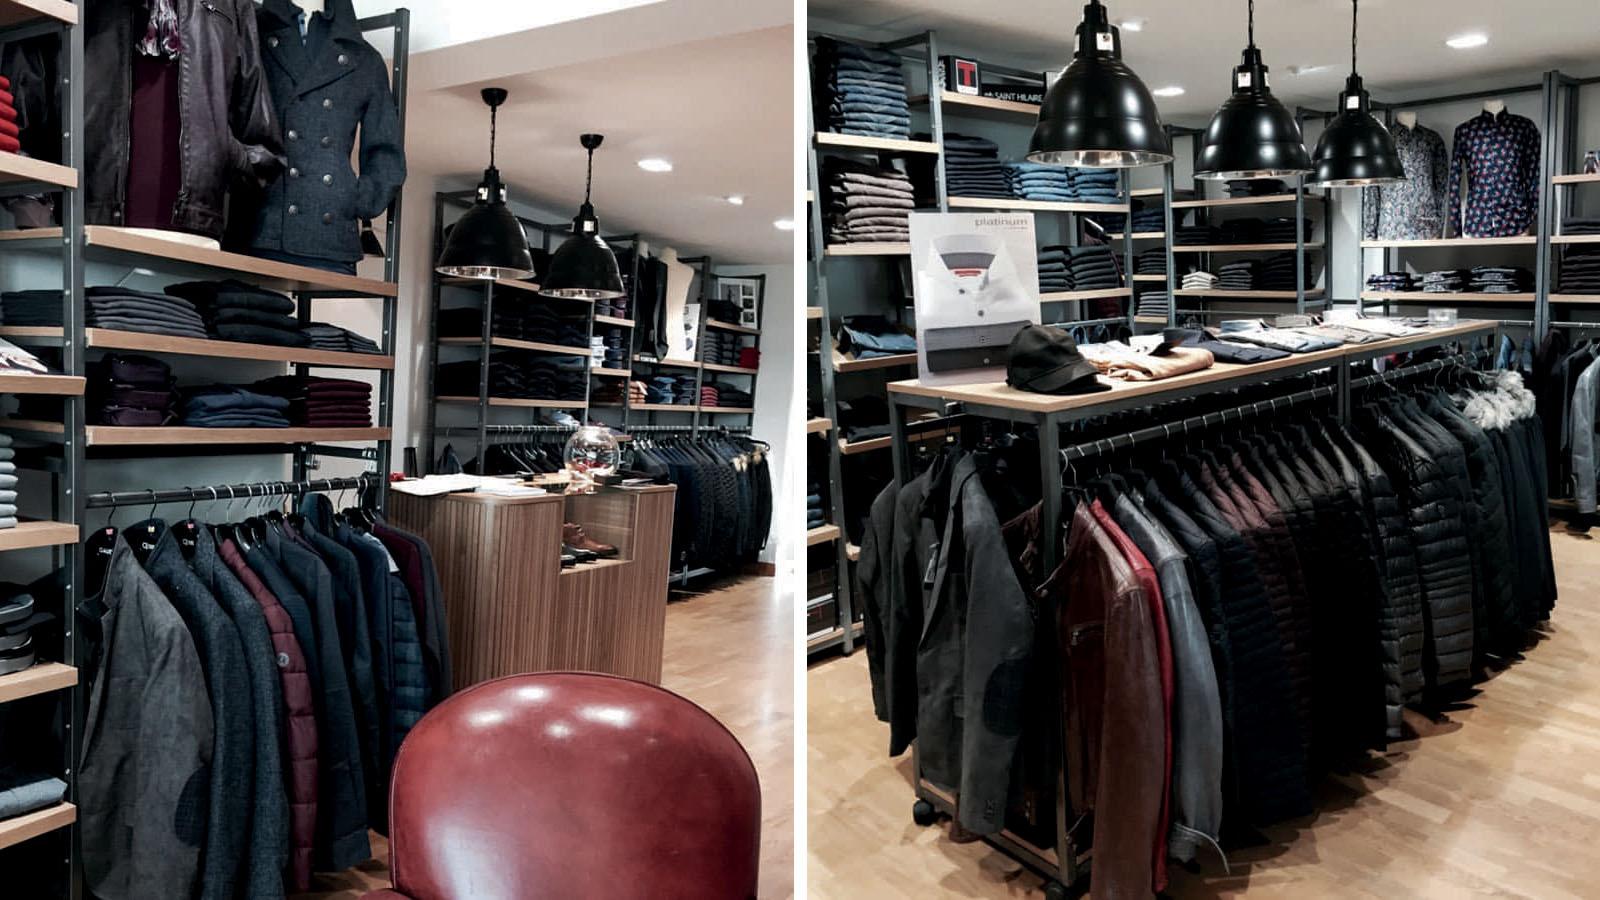 EFI Design Boutique Homme Mandin Roussay Efi Design 6 921